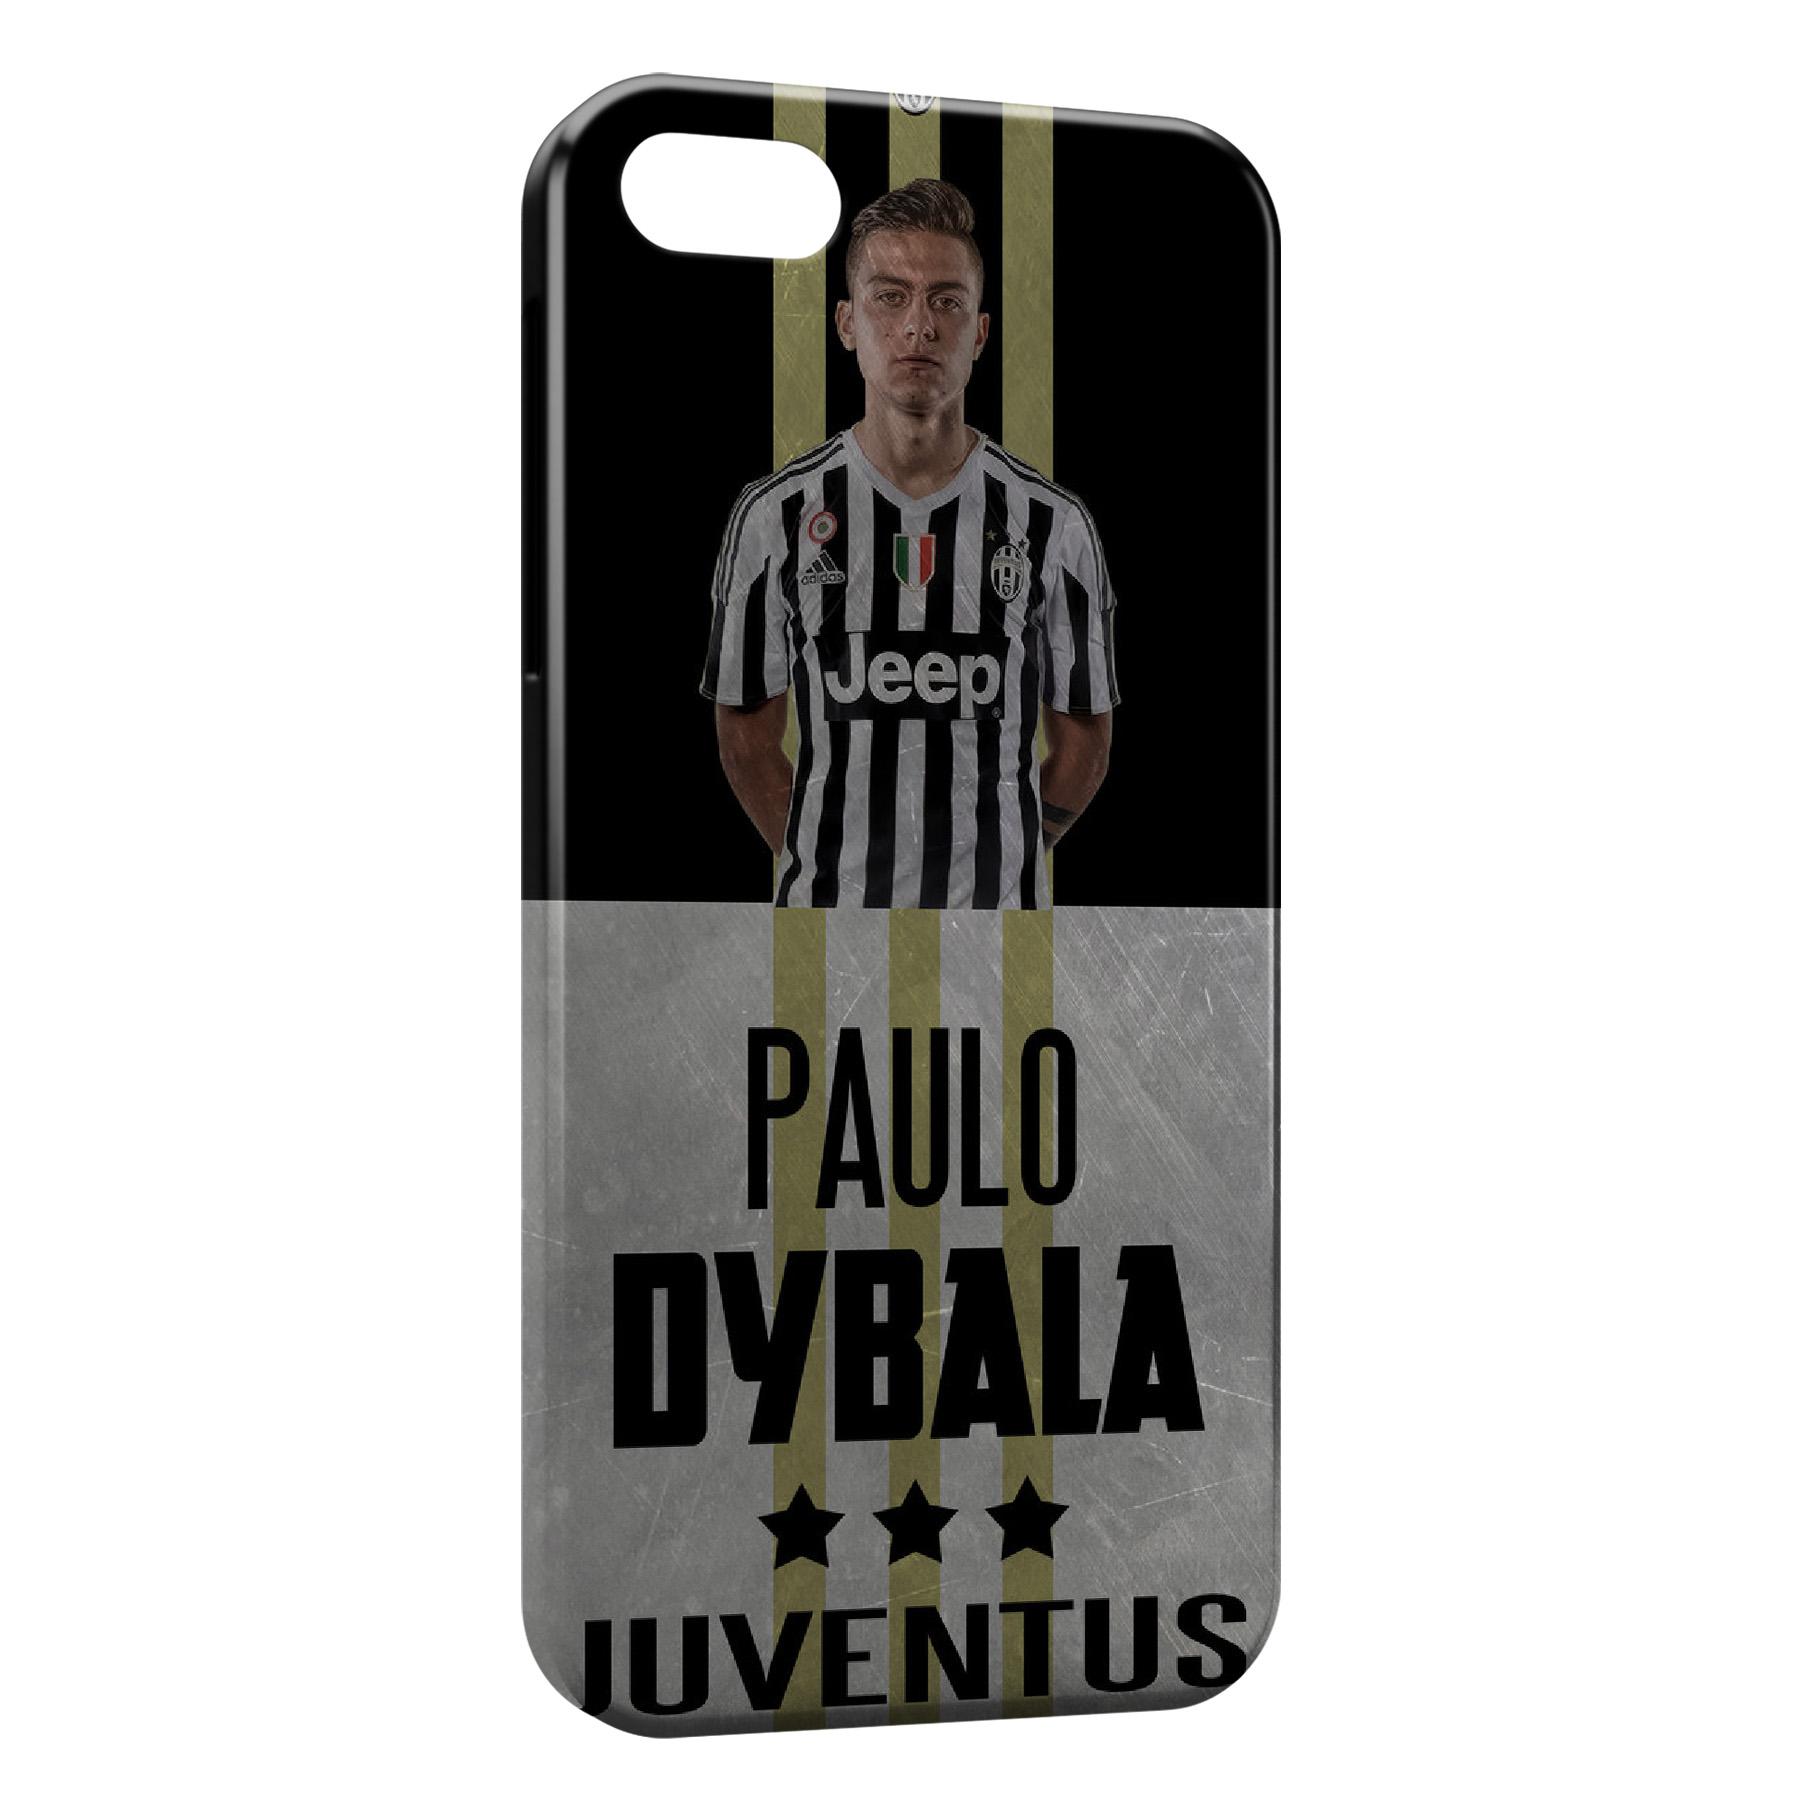 Coque iPhone 5C Juventus Football Paulo Dybala